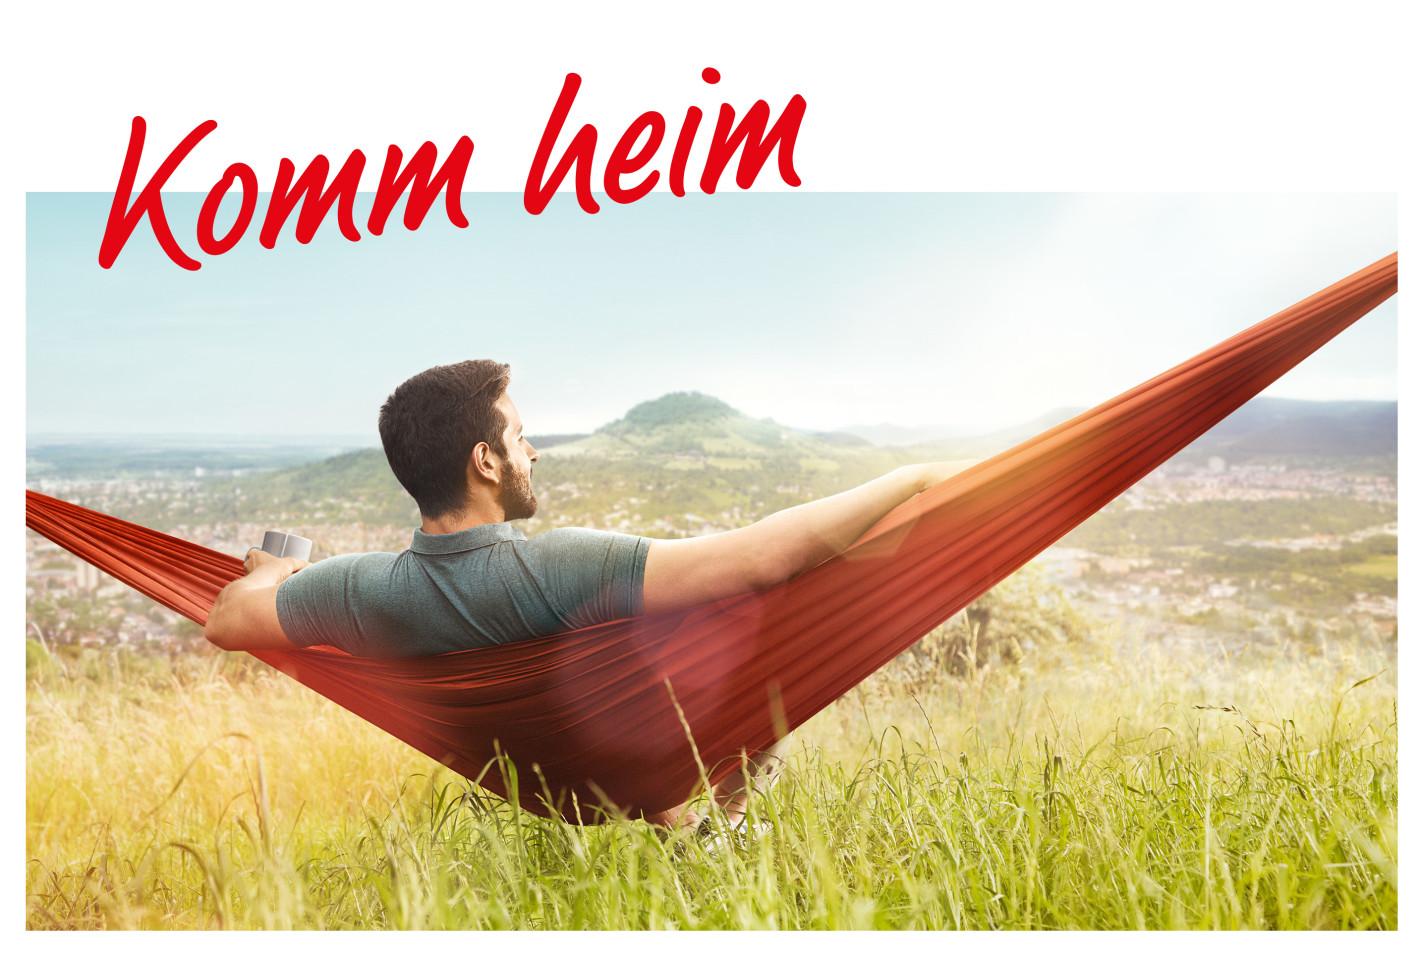 FAE_Komm_heim_1